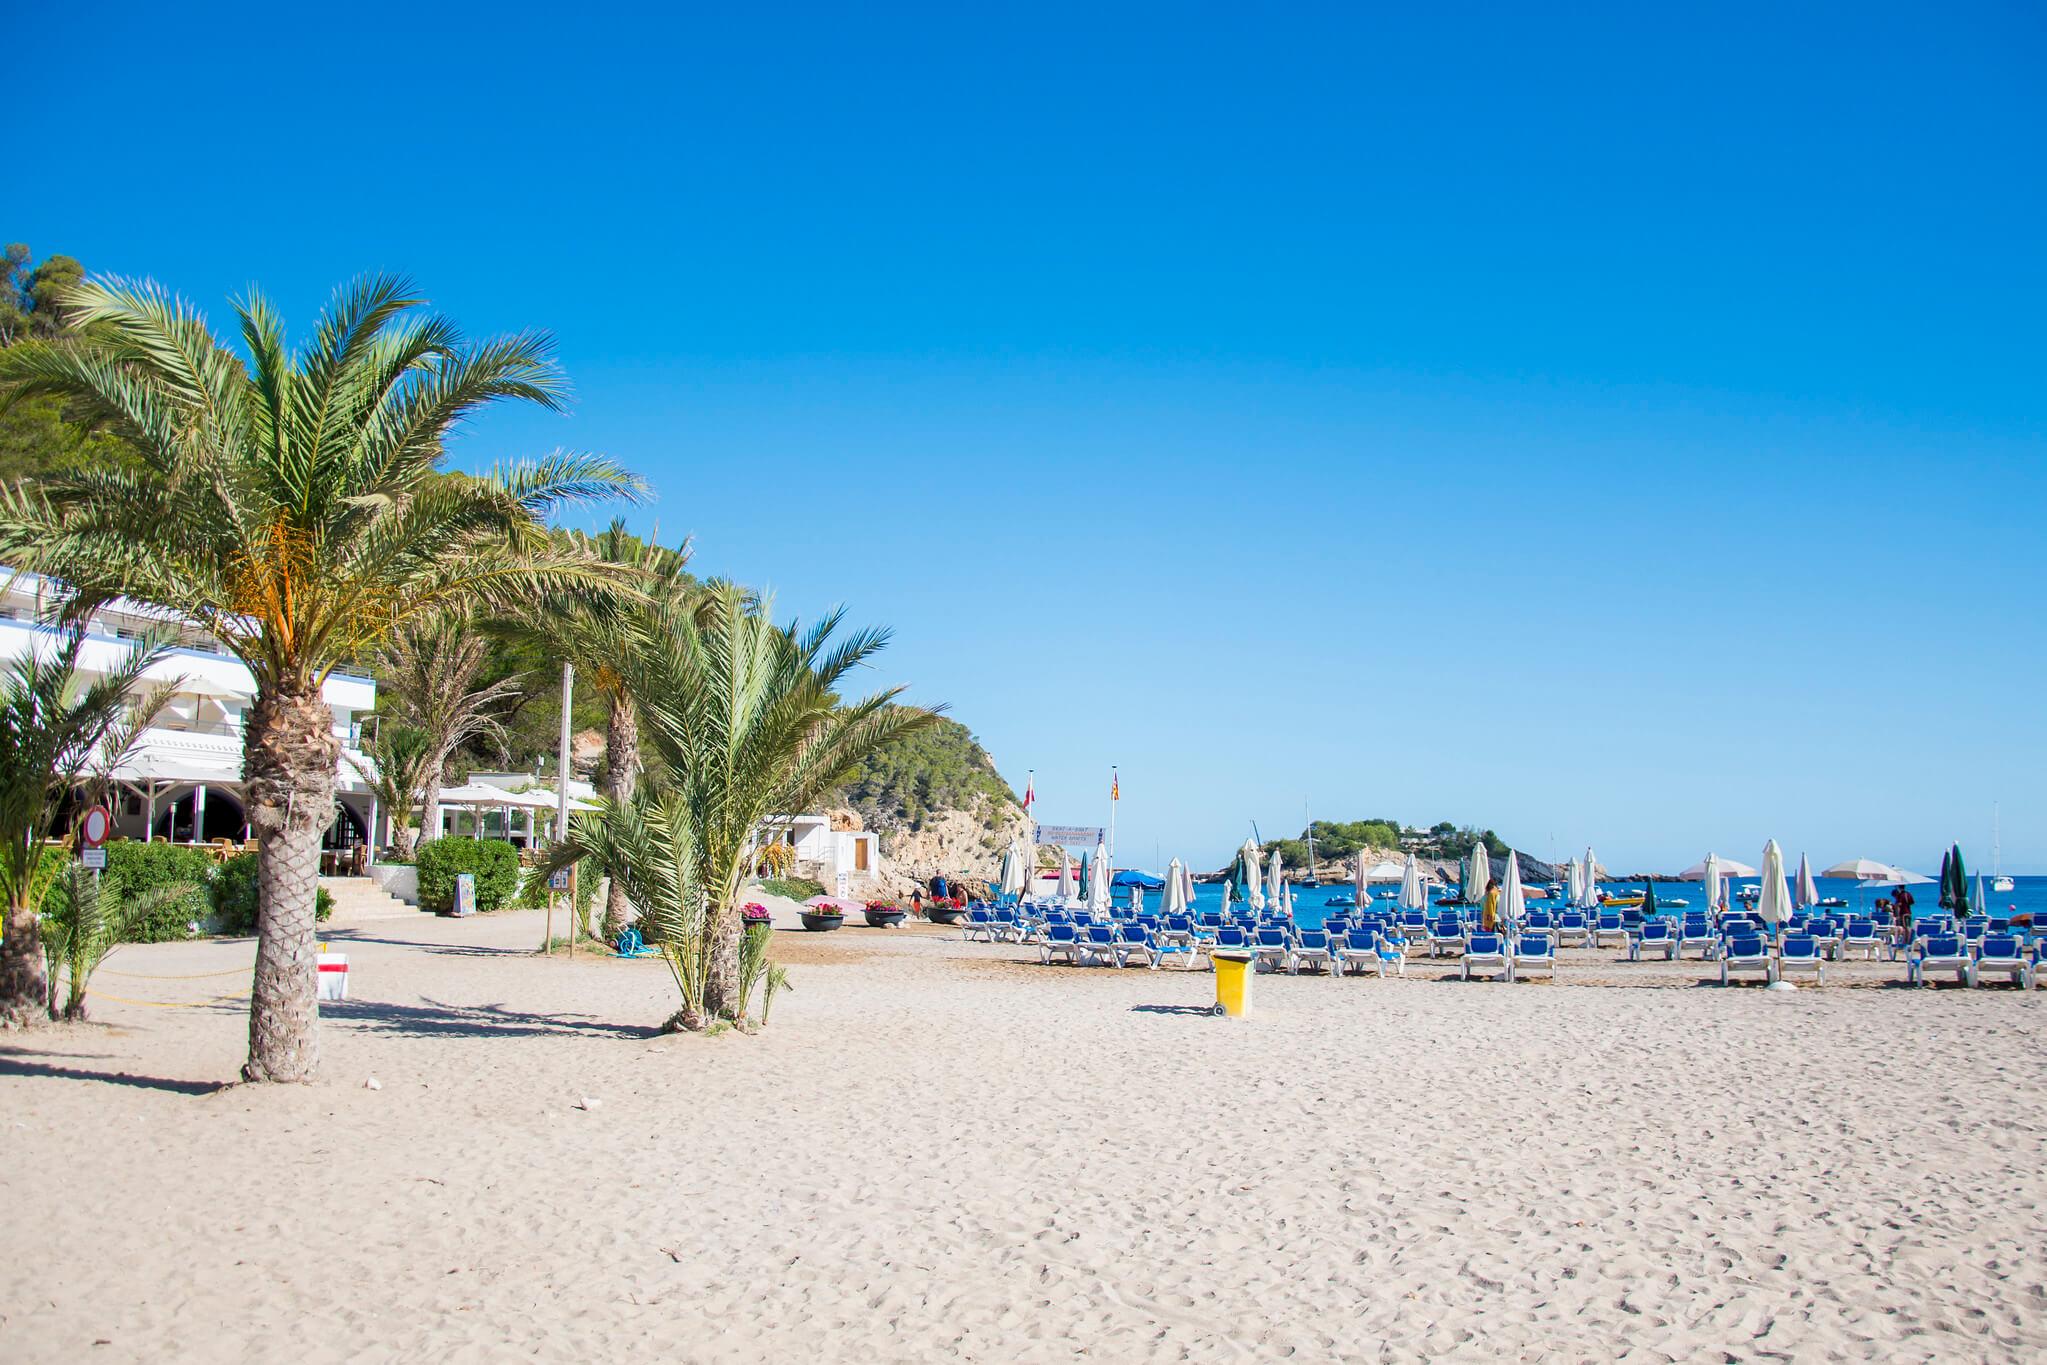 https://www.white-ibiza.com/wp-content/uploads/2020/03/ibiza-beaches-san-miguel-03.jpg